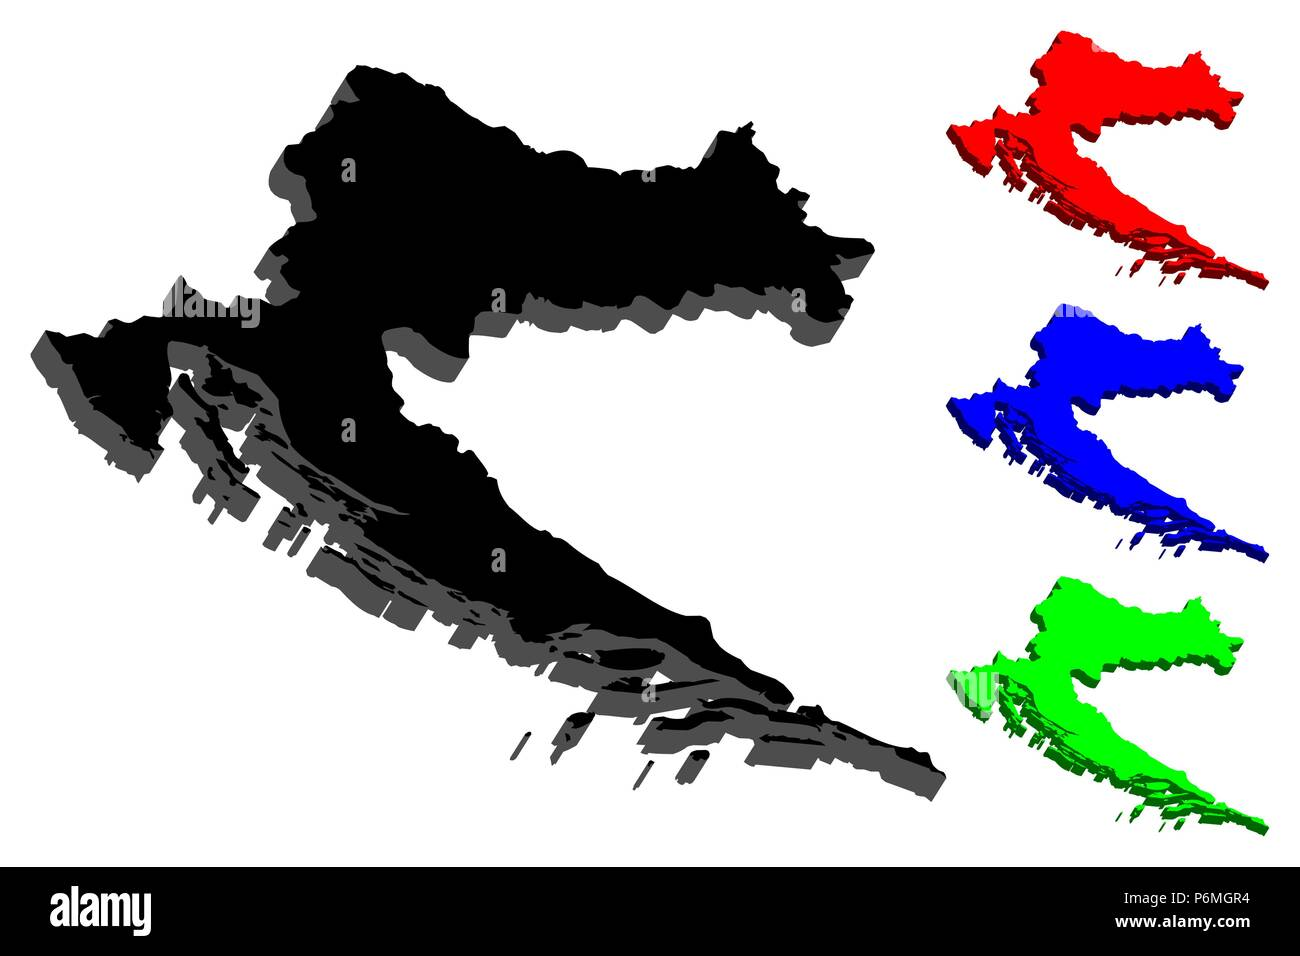 3D map of Croatia (Republic of Croatia) - black, red, blue and green ...